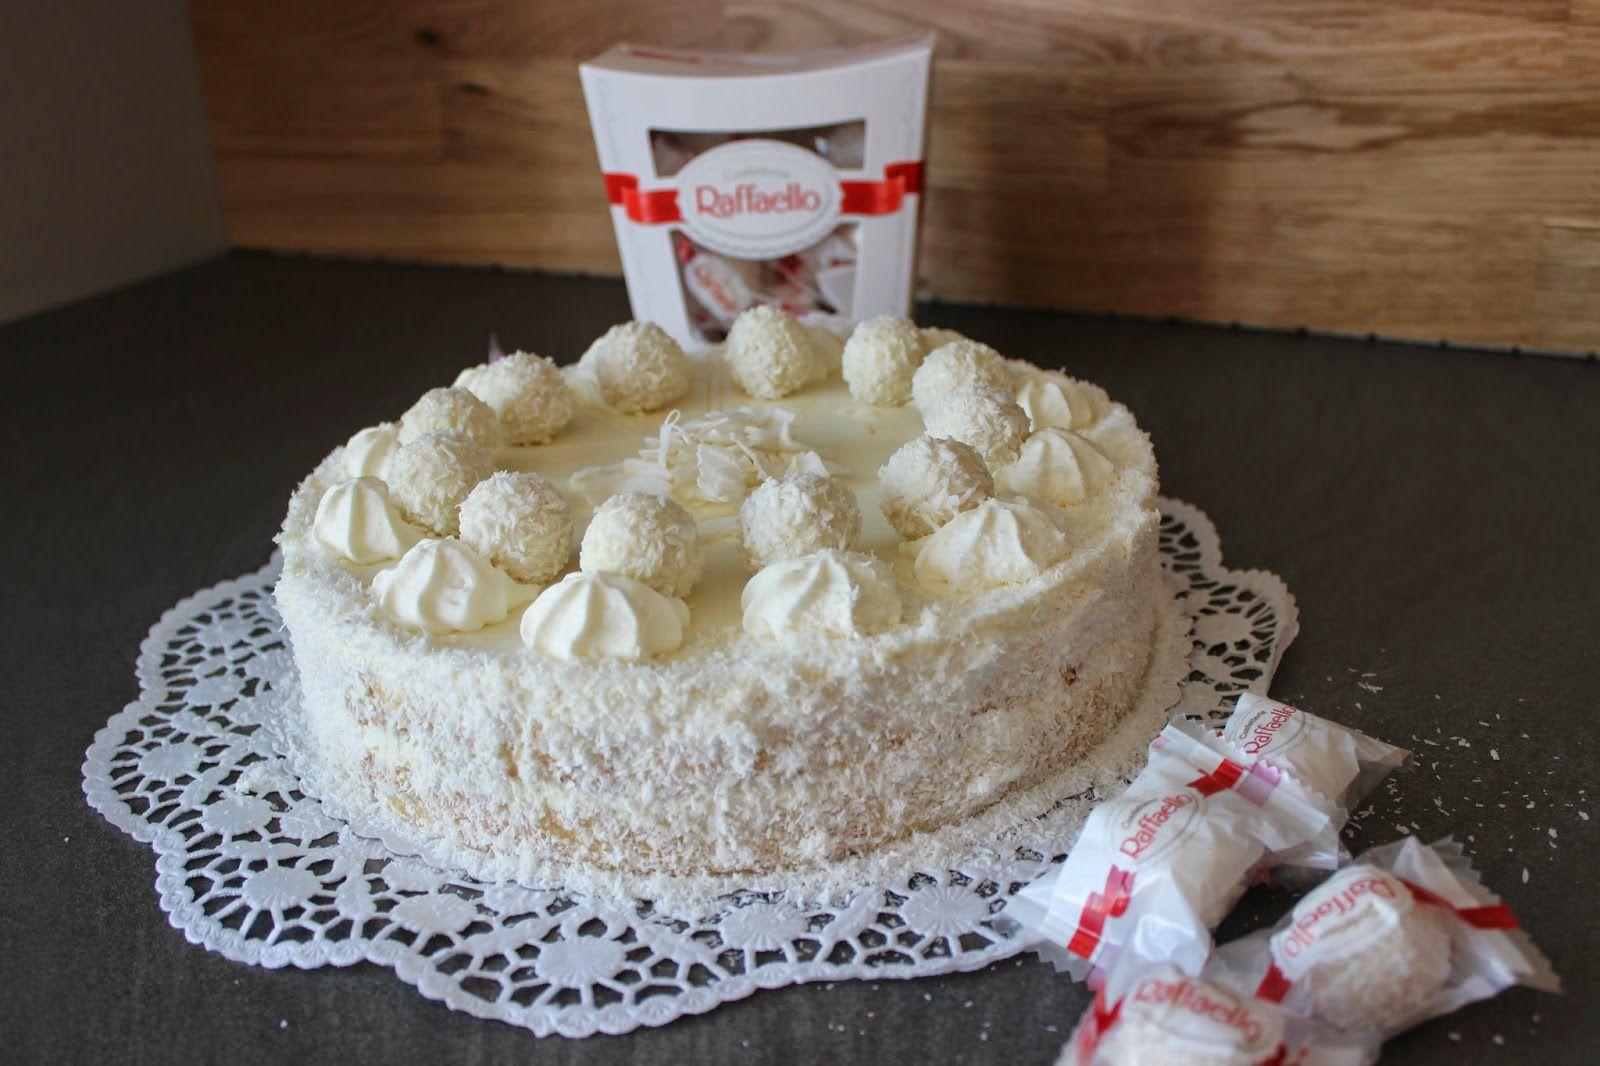 Kokos Torte Raffaello Torte Sallys Bunte Tortenwelt Kuchen Und Torten Rezepte Raffaello Torte Raffaello Kuchen